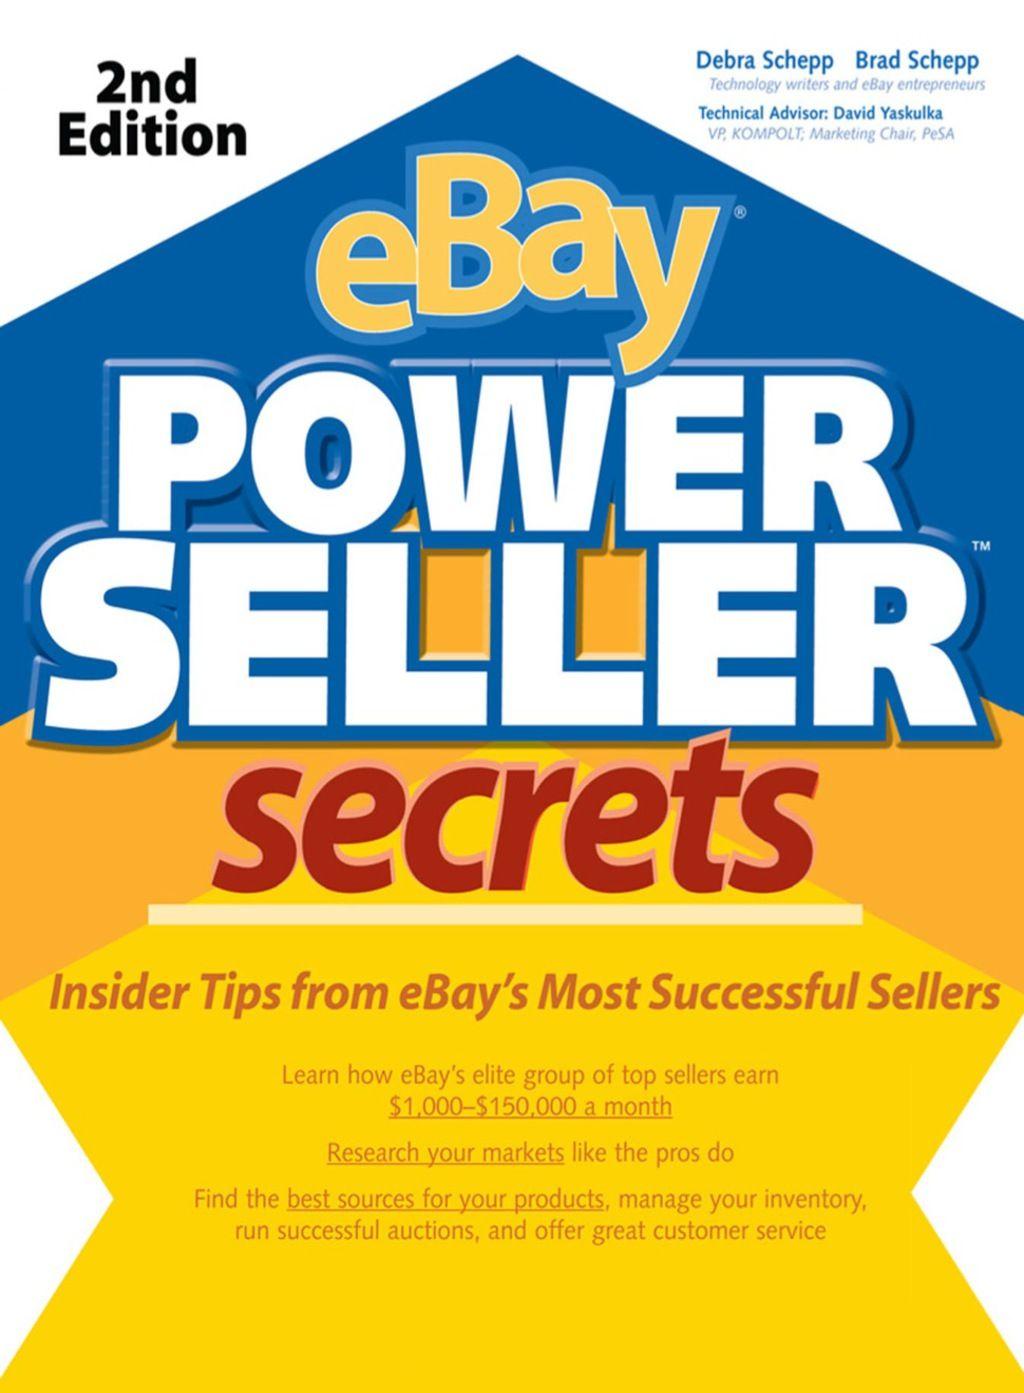 Ebay Powerseller Secrets 2e Ebook Ebay Selling On Ebay The Secret